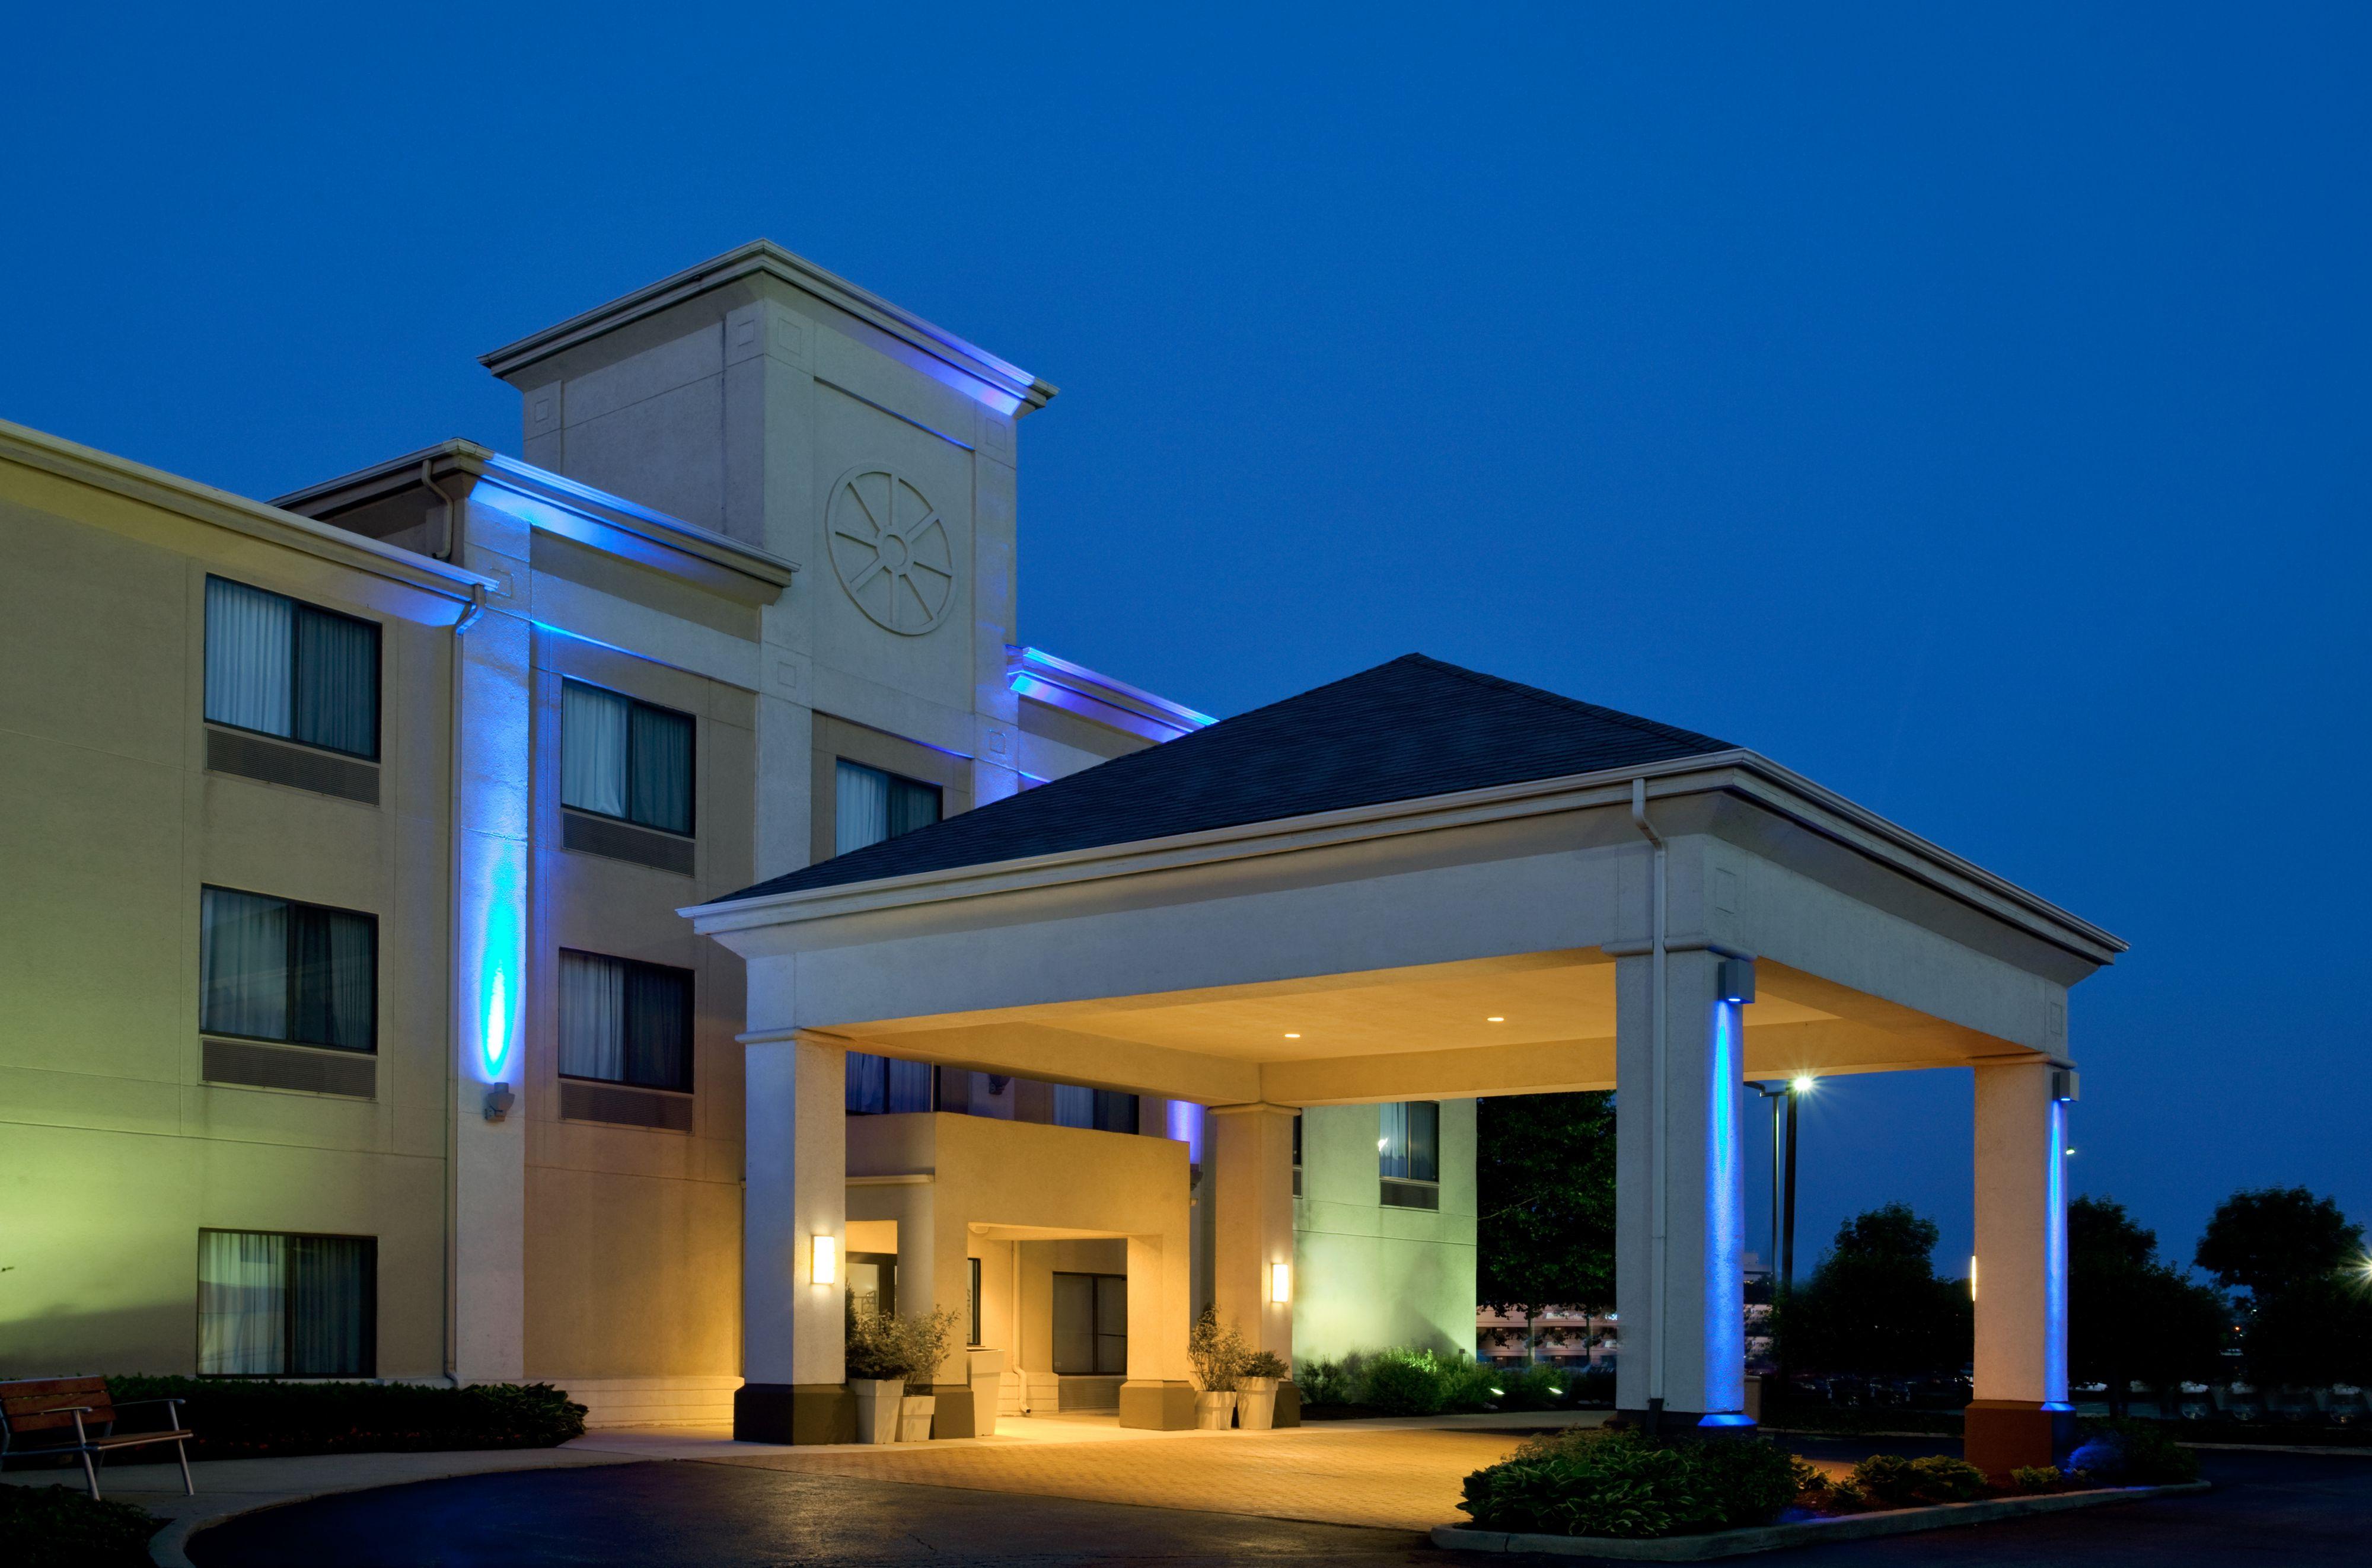 Holiday Inn Express & Suites Meriden image 5